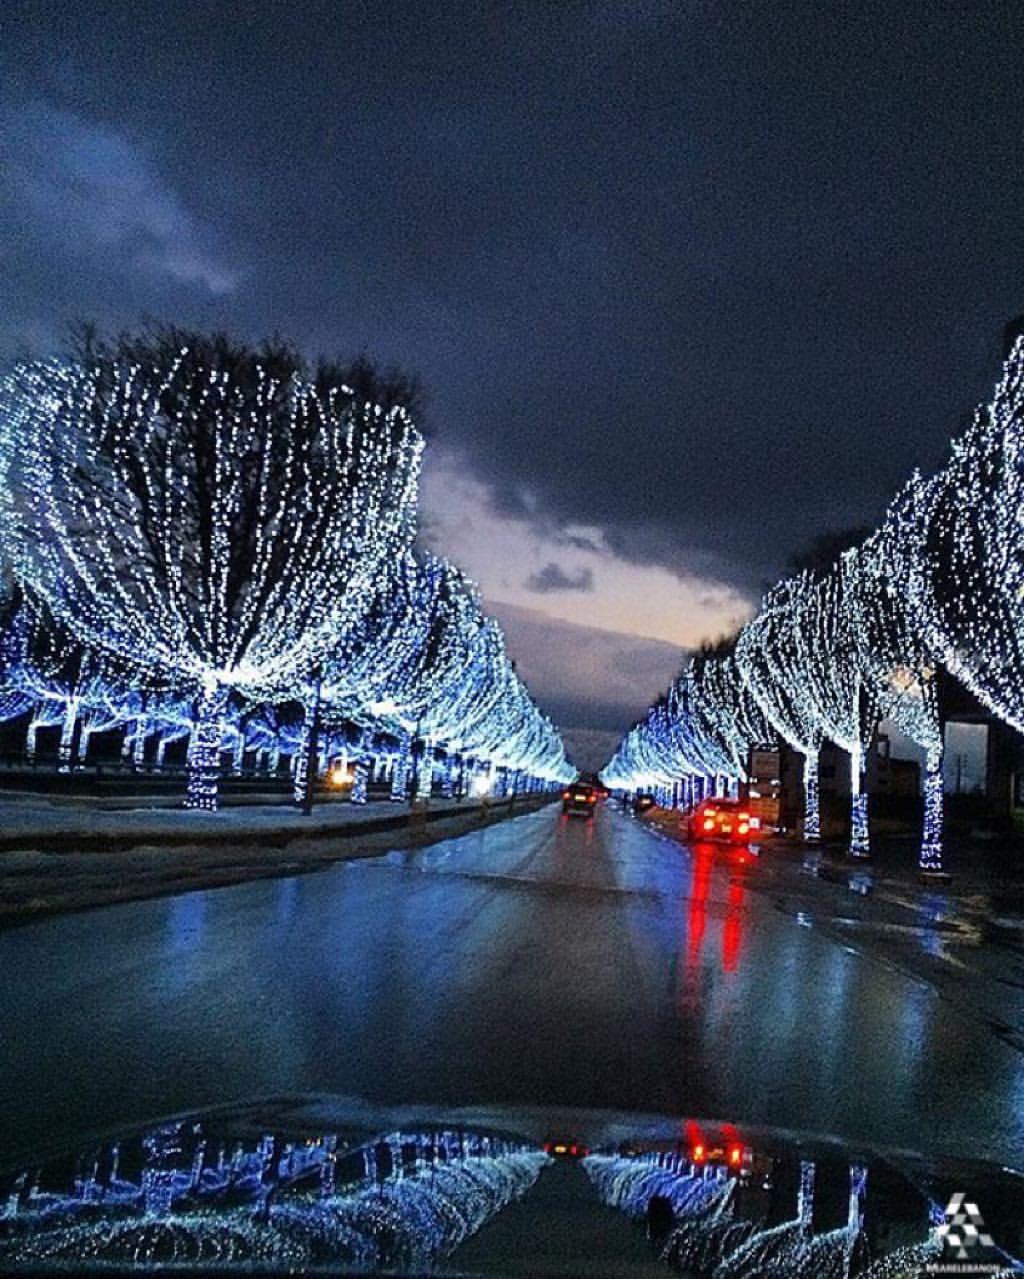 Zahle sparkles at night ❄️ By @frederickazar #WeAreLebanon  #Lebanon #WeAreLebanon